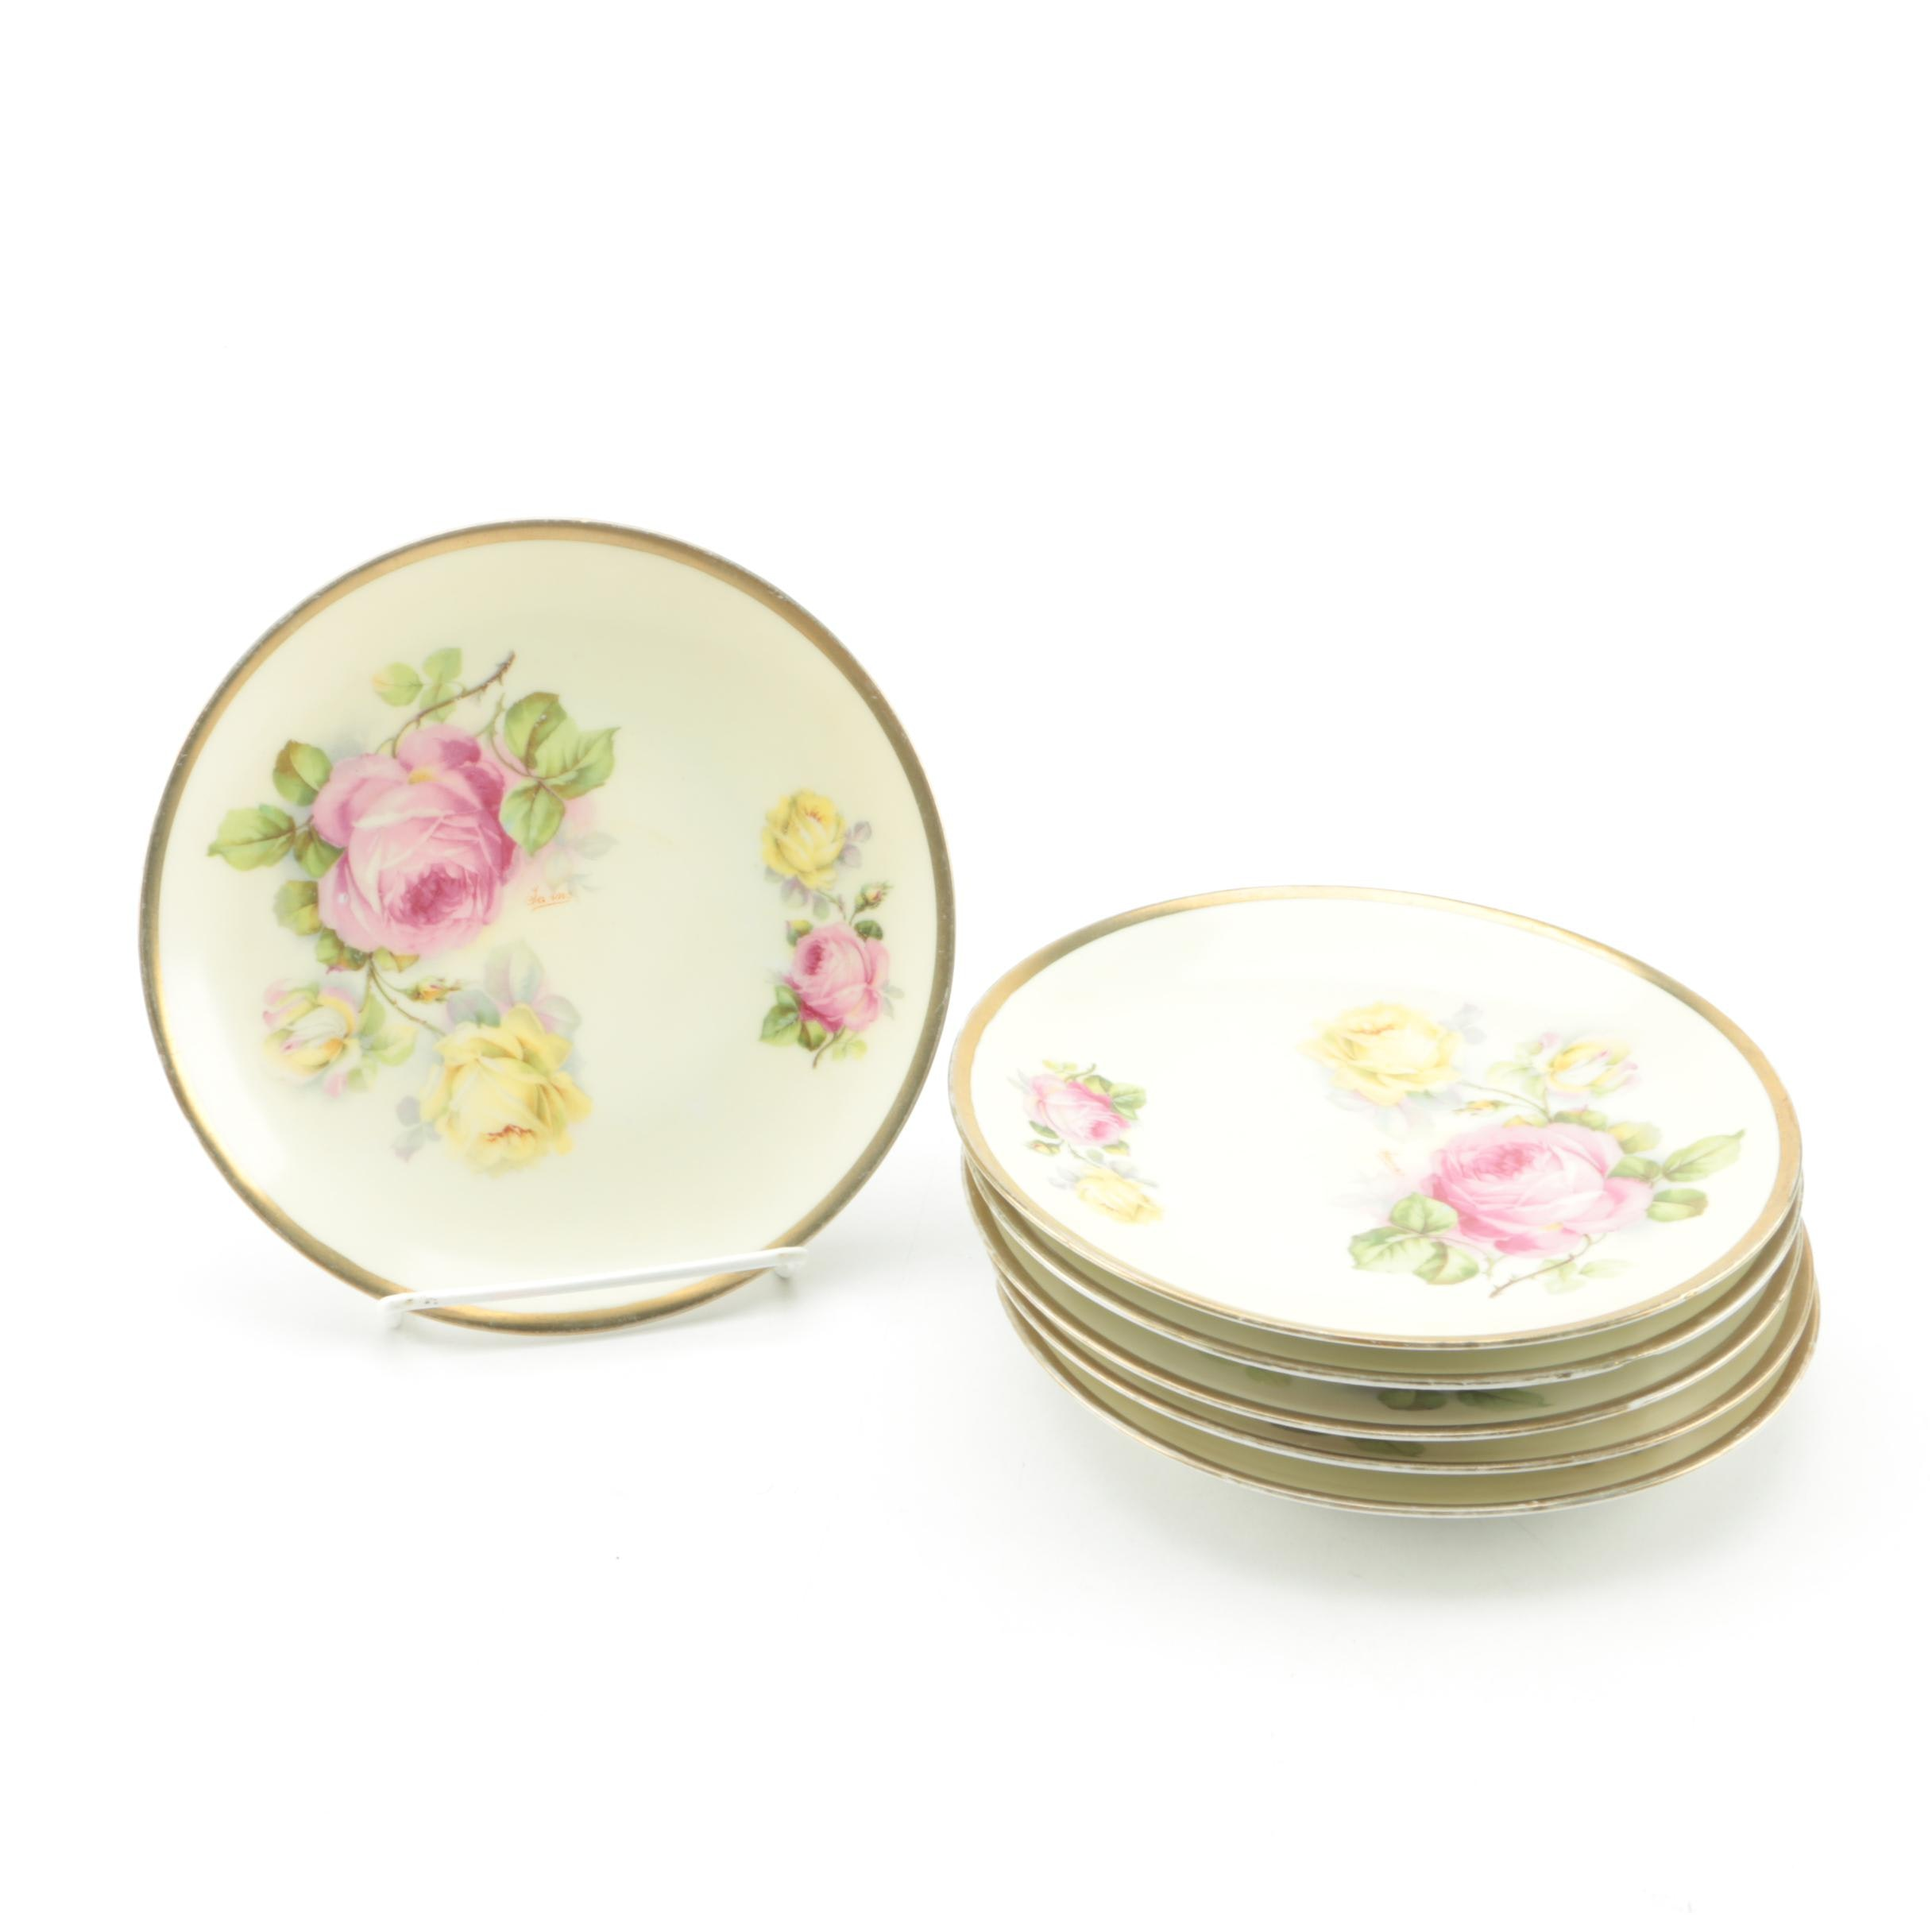 Vintage O. E. & G Royal Austria Porcelain Plates